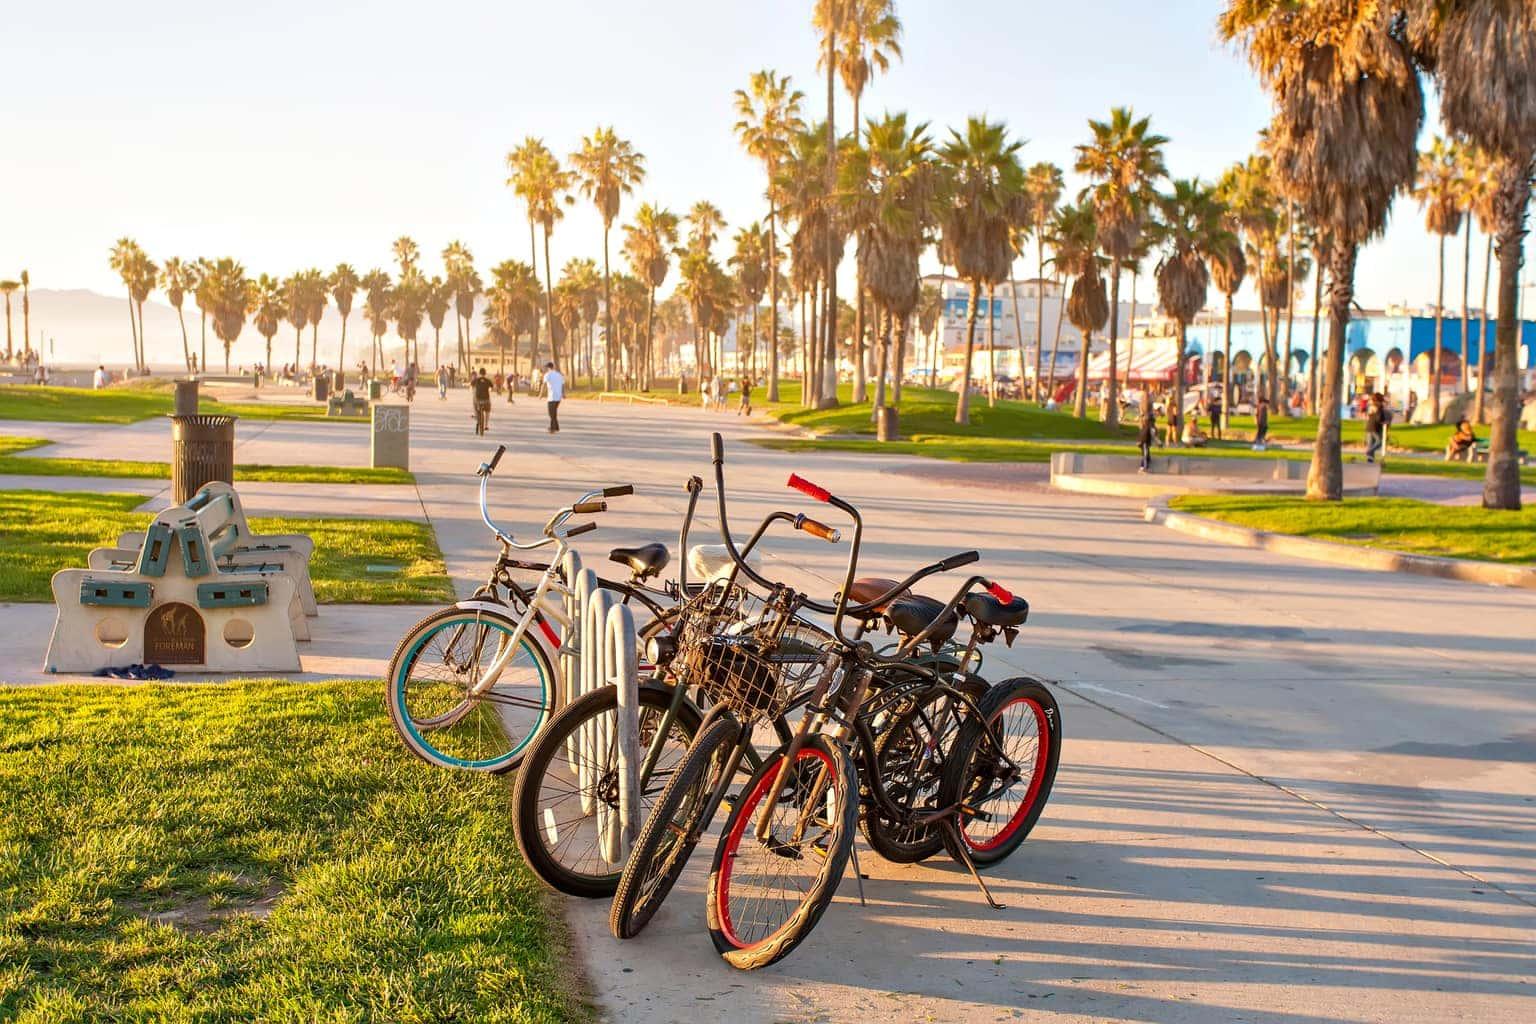 Venice Beach in Los Angeles California